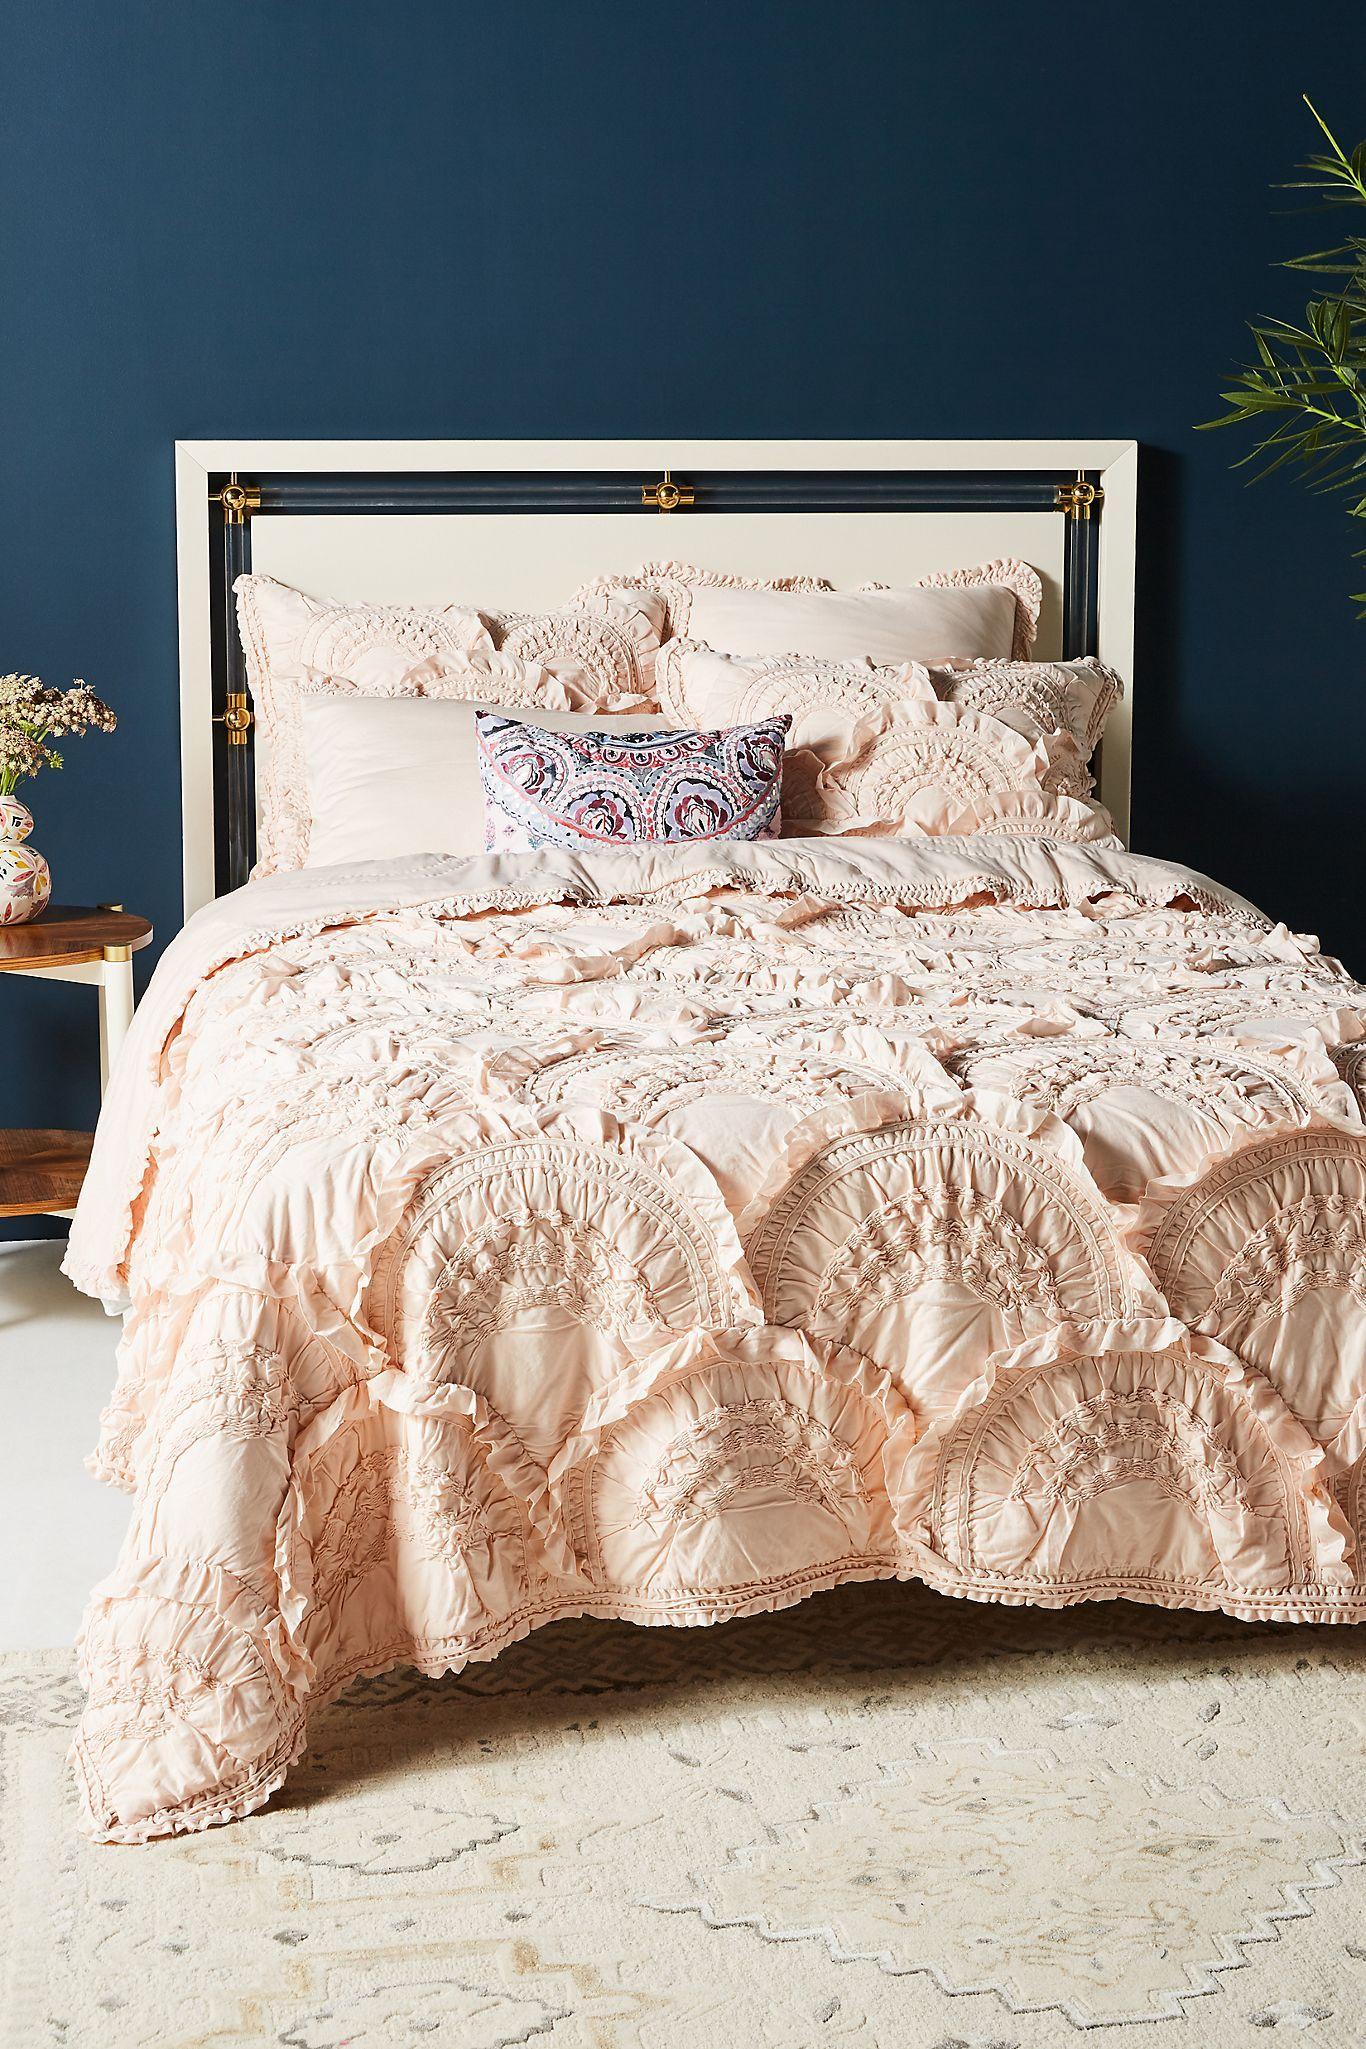 Rivulets Quilt Anthropologie Anthropologie Bedroom Bedding Sets Anthropologie Bedding